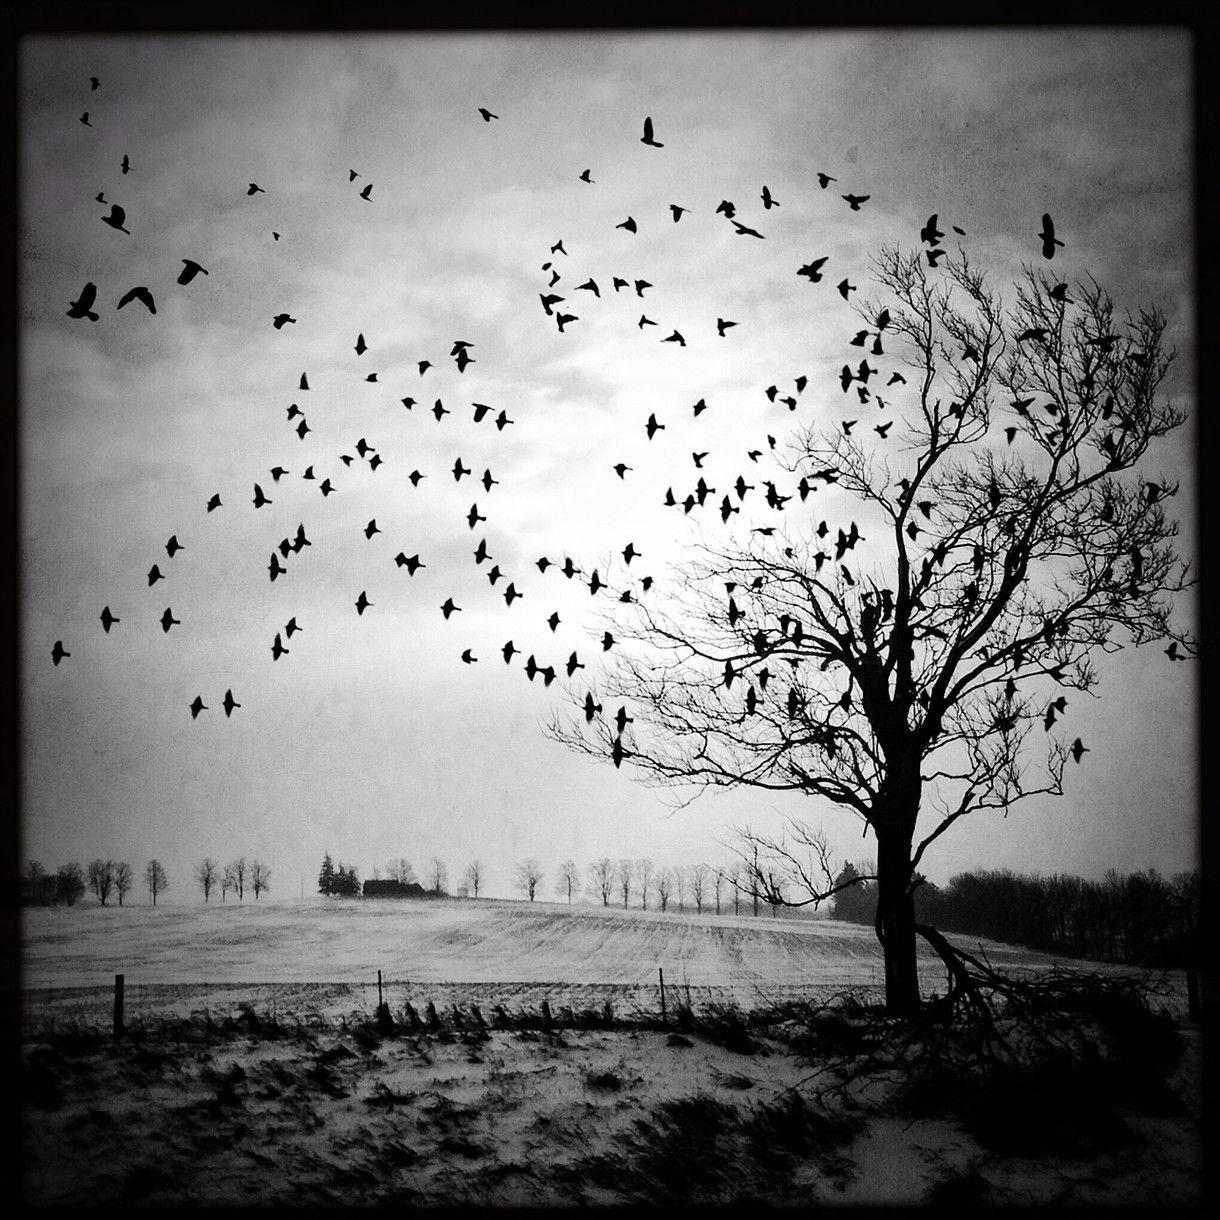 Dramatic Tree Photo Birds Flying Photo Nature Photo Black White Landscape Winter Tree Birds Black And White Birds Fine Art Photography Print Birds Flying